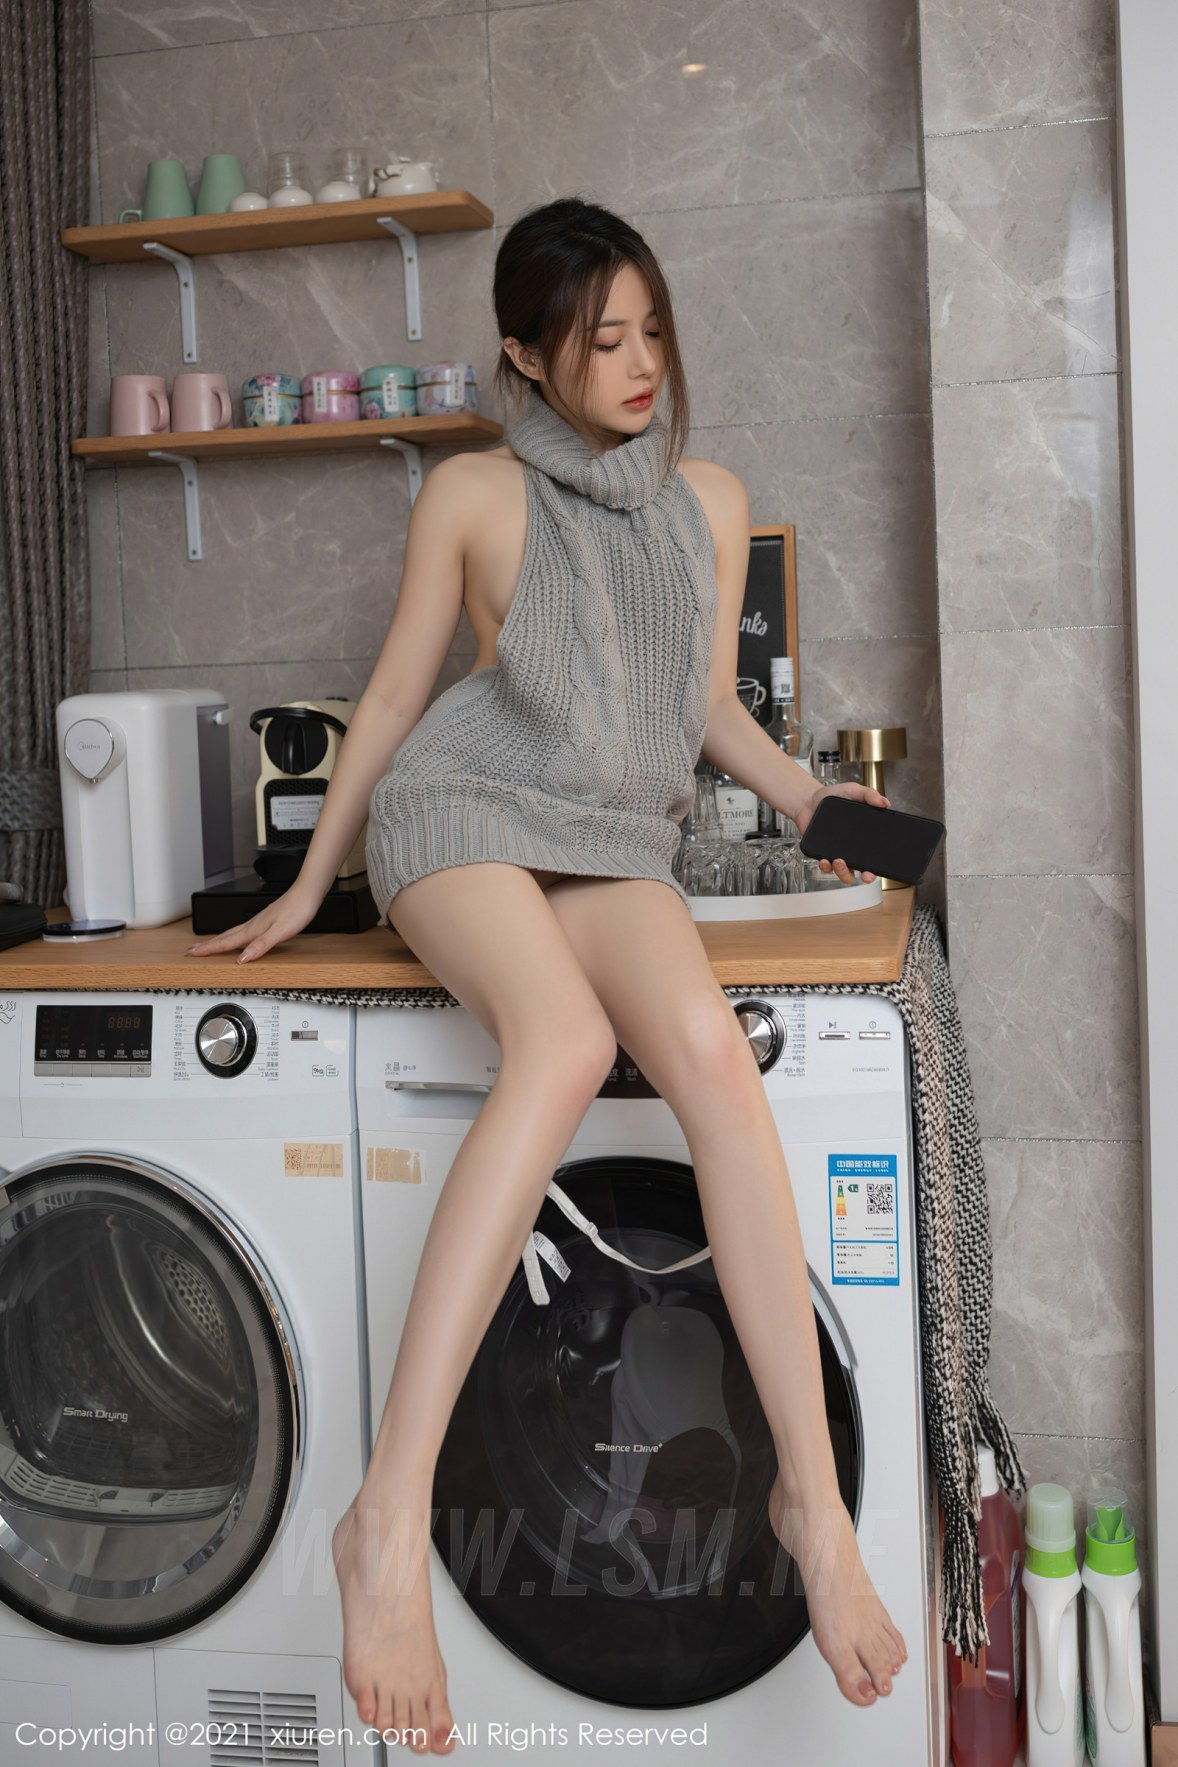 3620 039 udx 3600 5400 - XiuRen 秀人 No.3620 洗衣机维修主题 鱼子酱Fish 性感写真111 - 秀人网 -【免费在线写真】【丽人丝语】